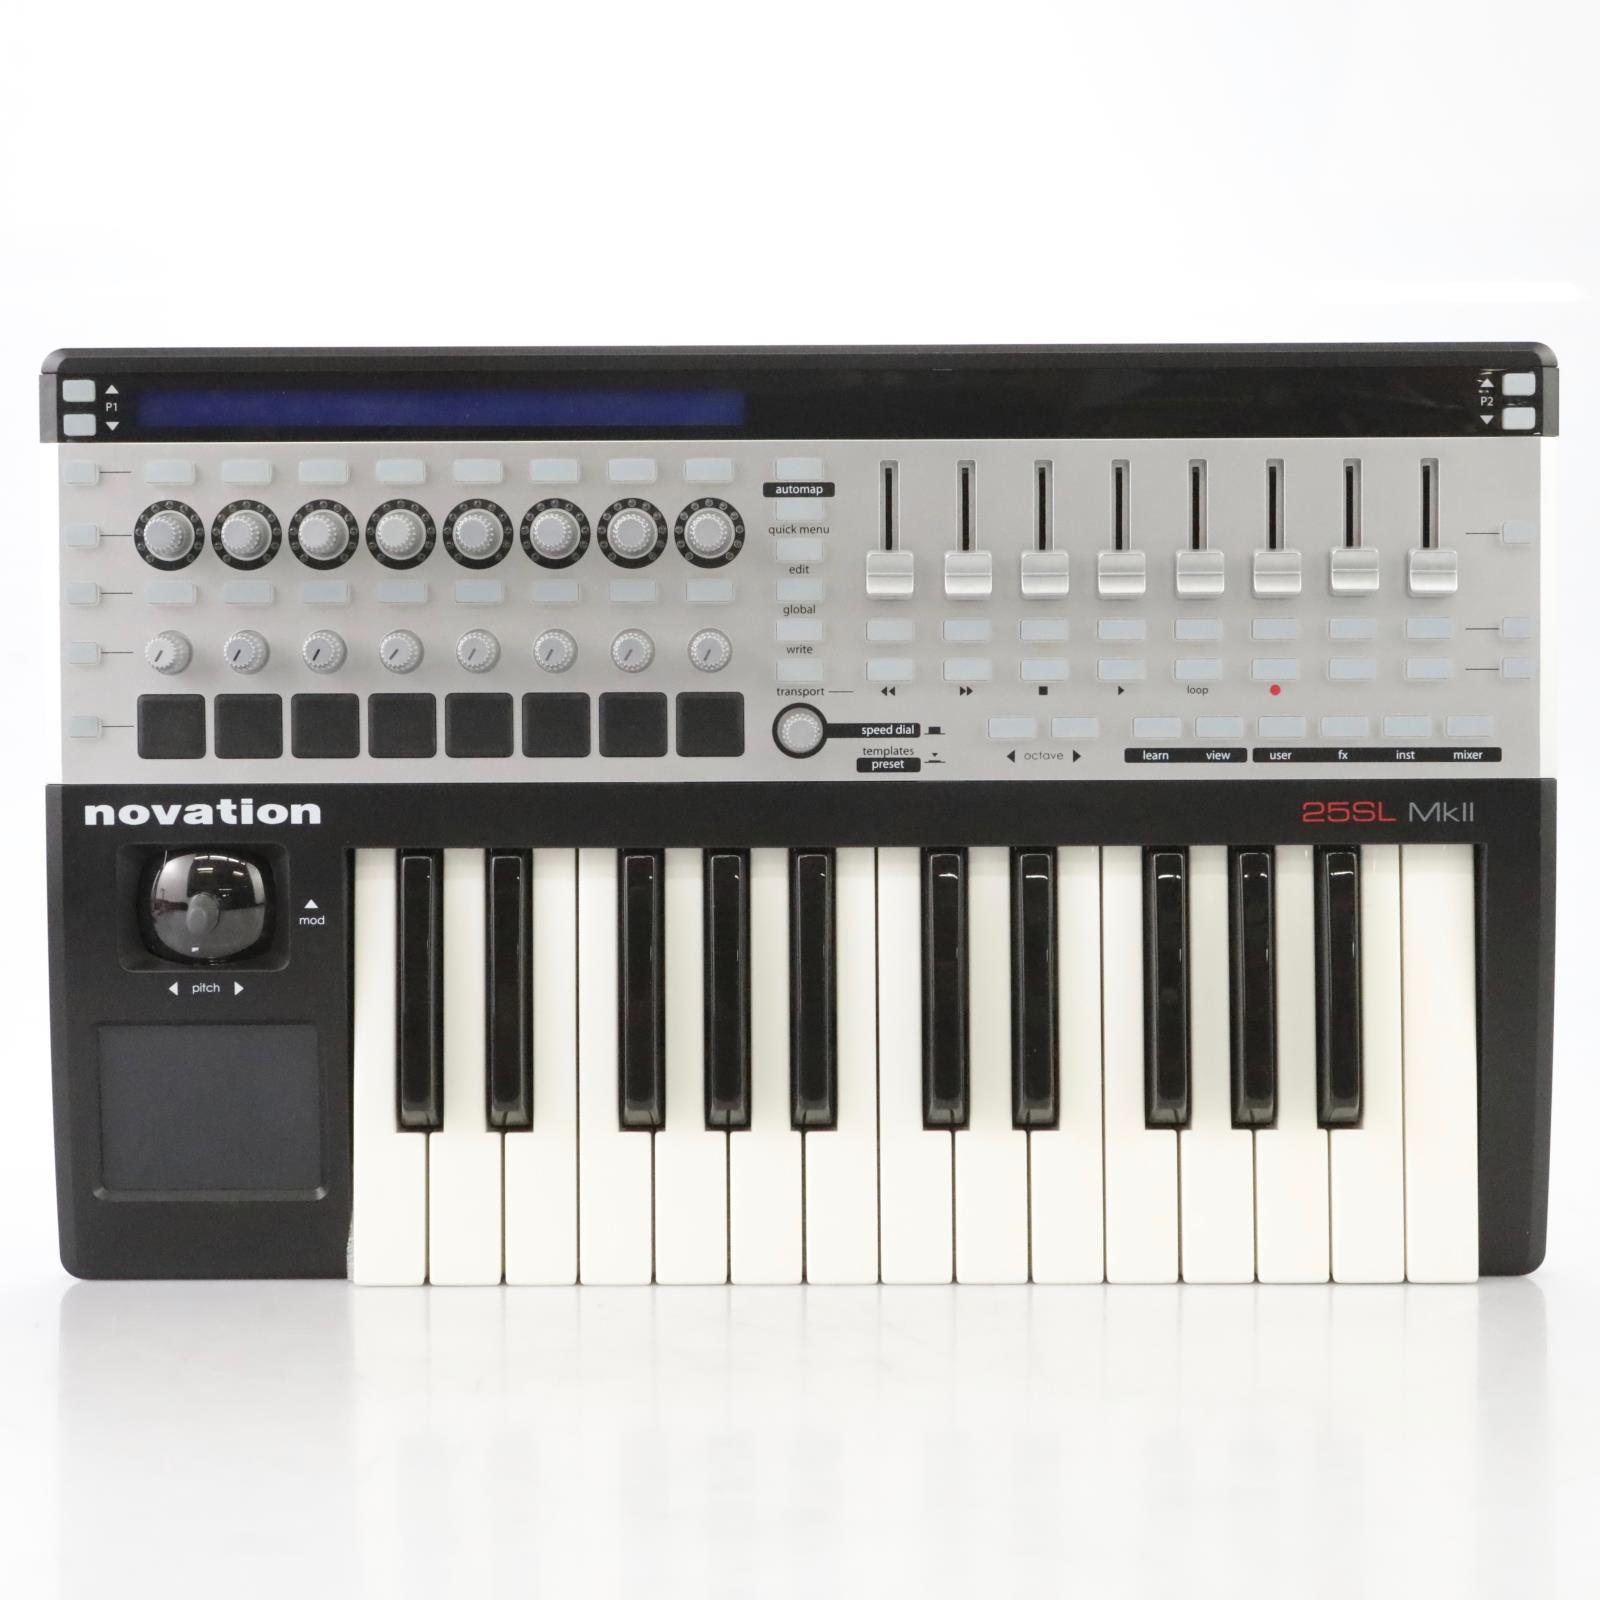 Novation 25SL MKII 25-Note USB MIDI Controller Keyboard w/ Original Box #44424